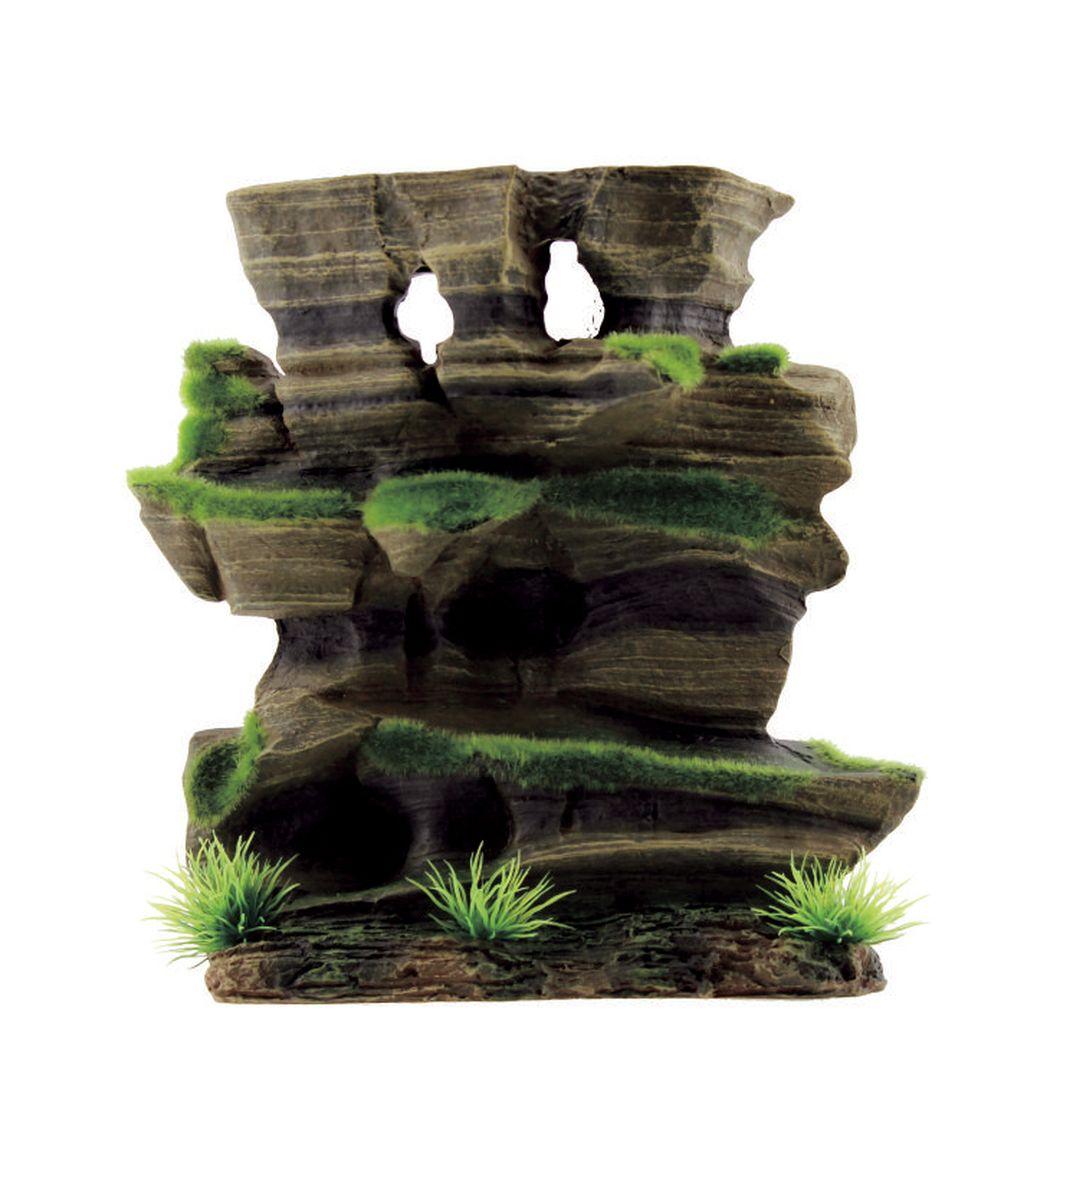 Декорация для аквариума ArtUniq Фигурная скала со мхом, 20,5 x 8,5 x 20,5 см0120710Декорация для аквариума ArtUniq Фигурная скала со мхом, 20,5 x 8,5 x 20,5 см